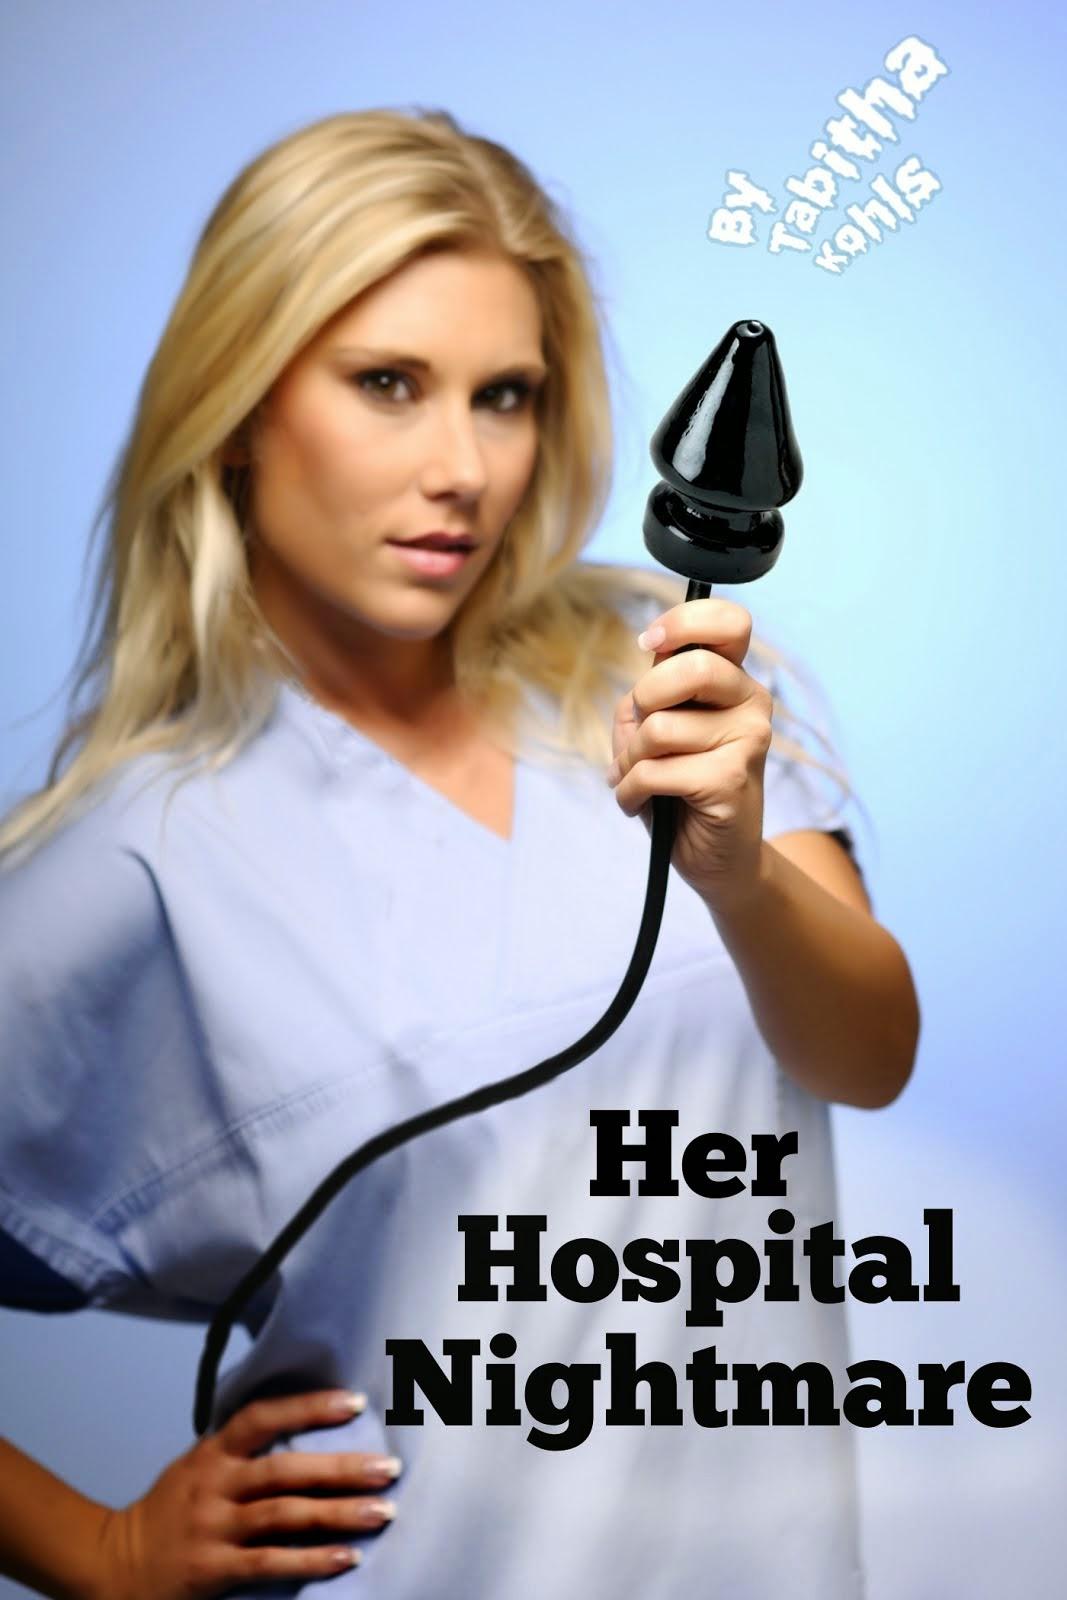 Her Hospital Nightmare